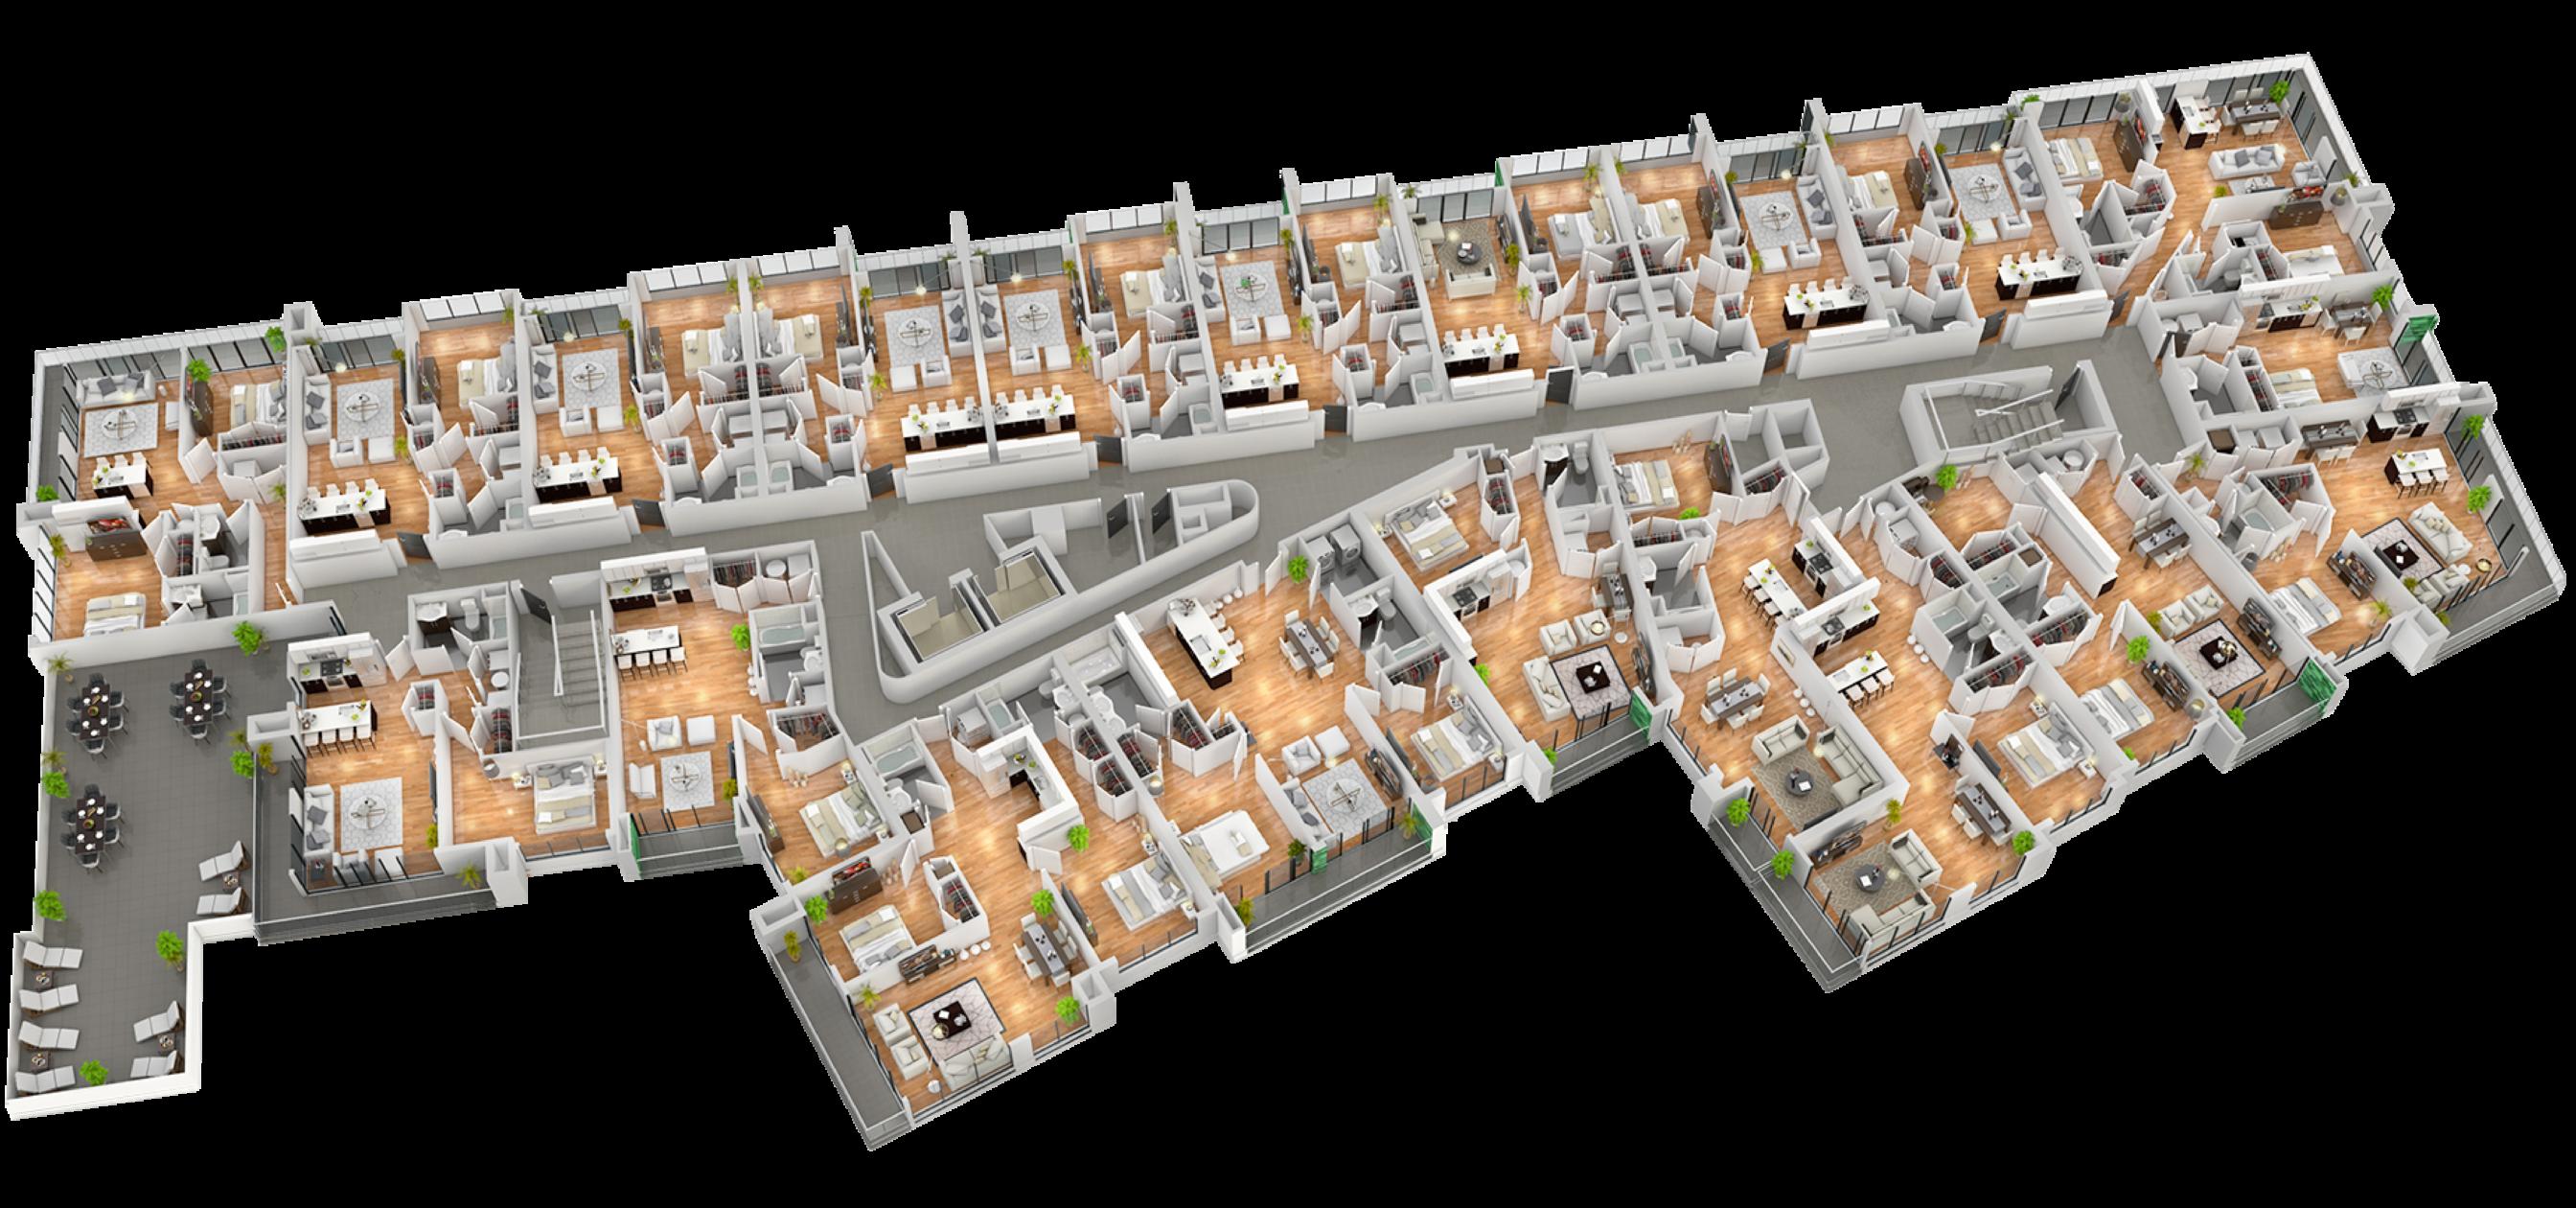 Liberty Square Building 1 Level 3 Floor Plan